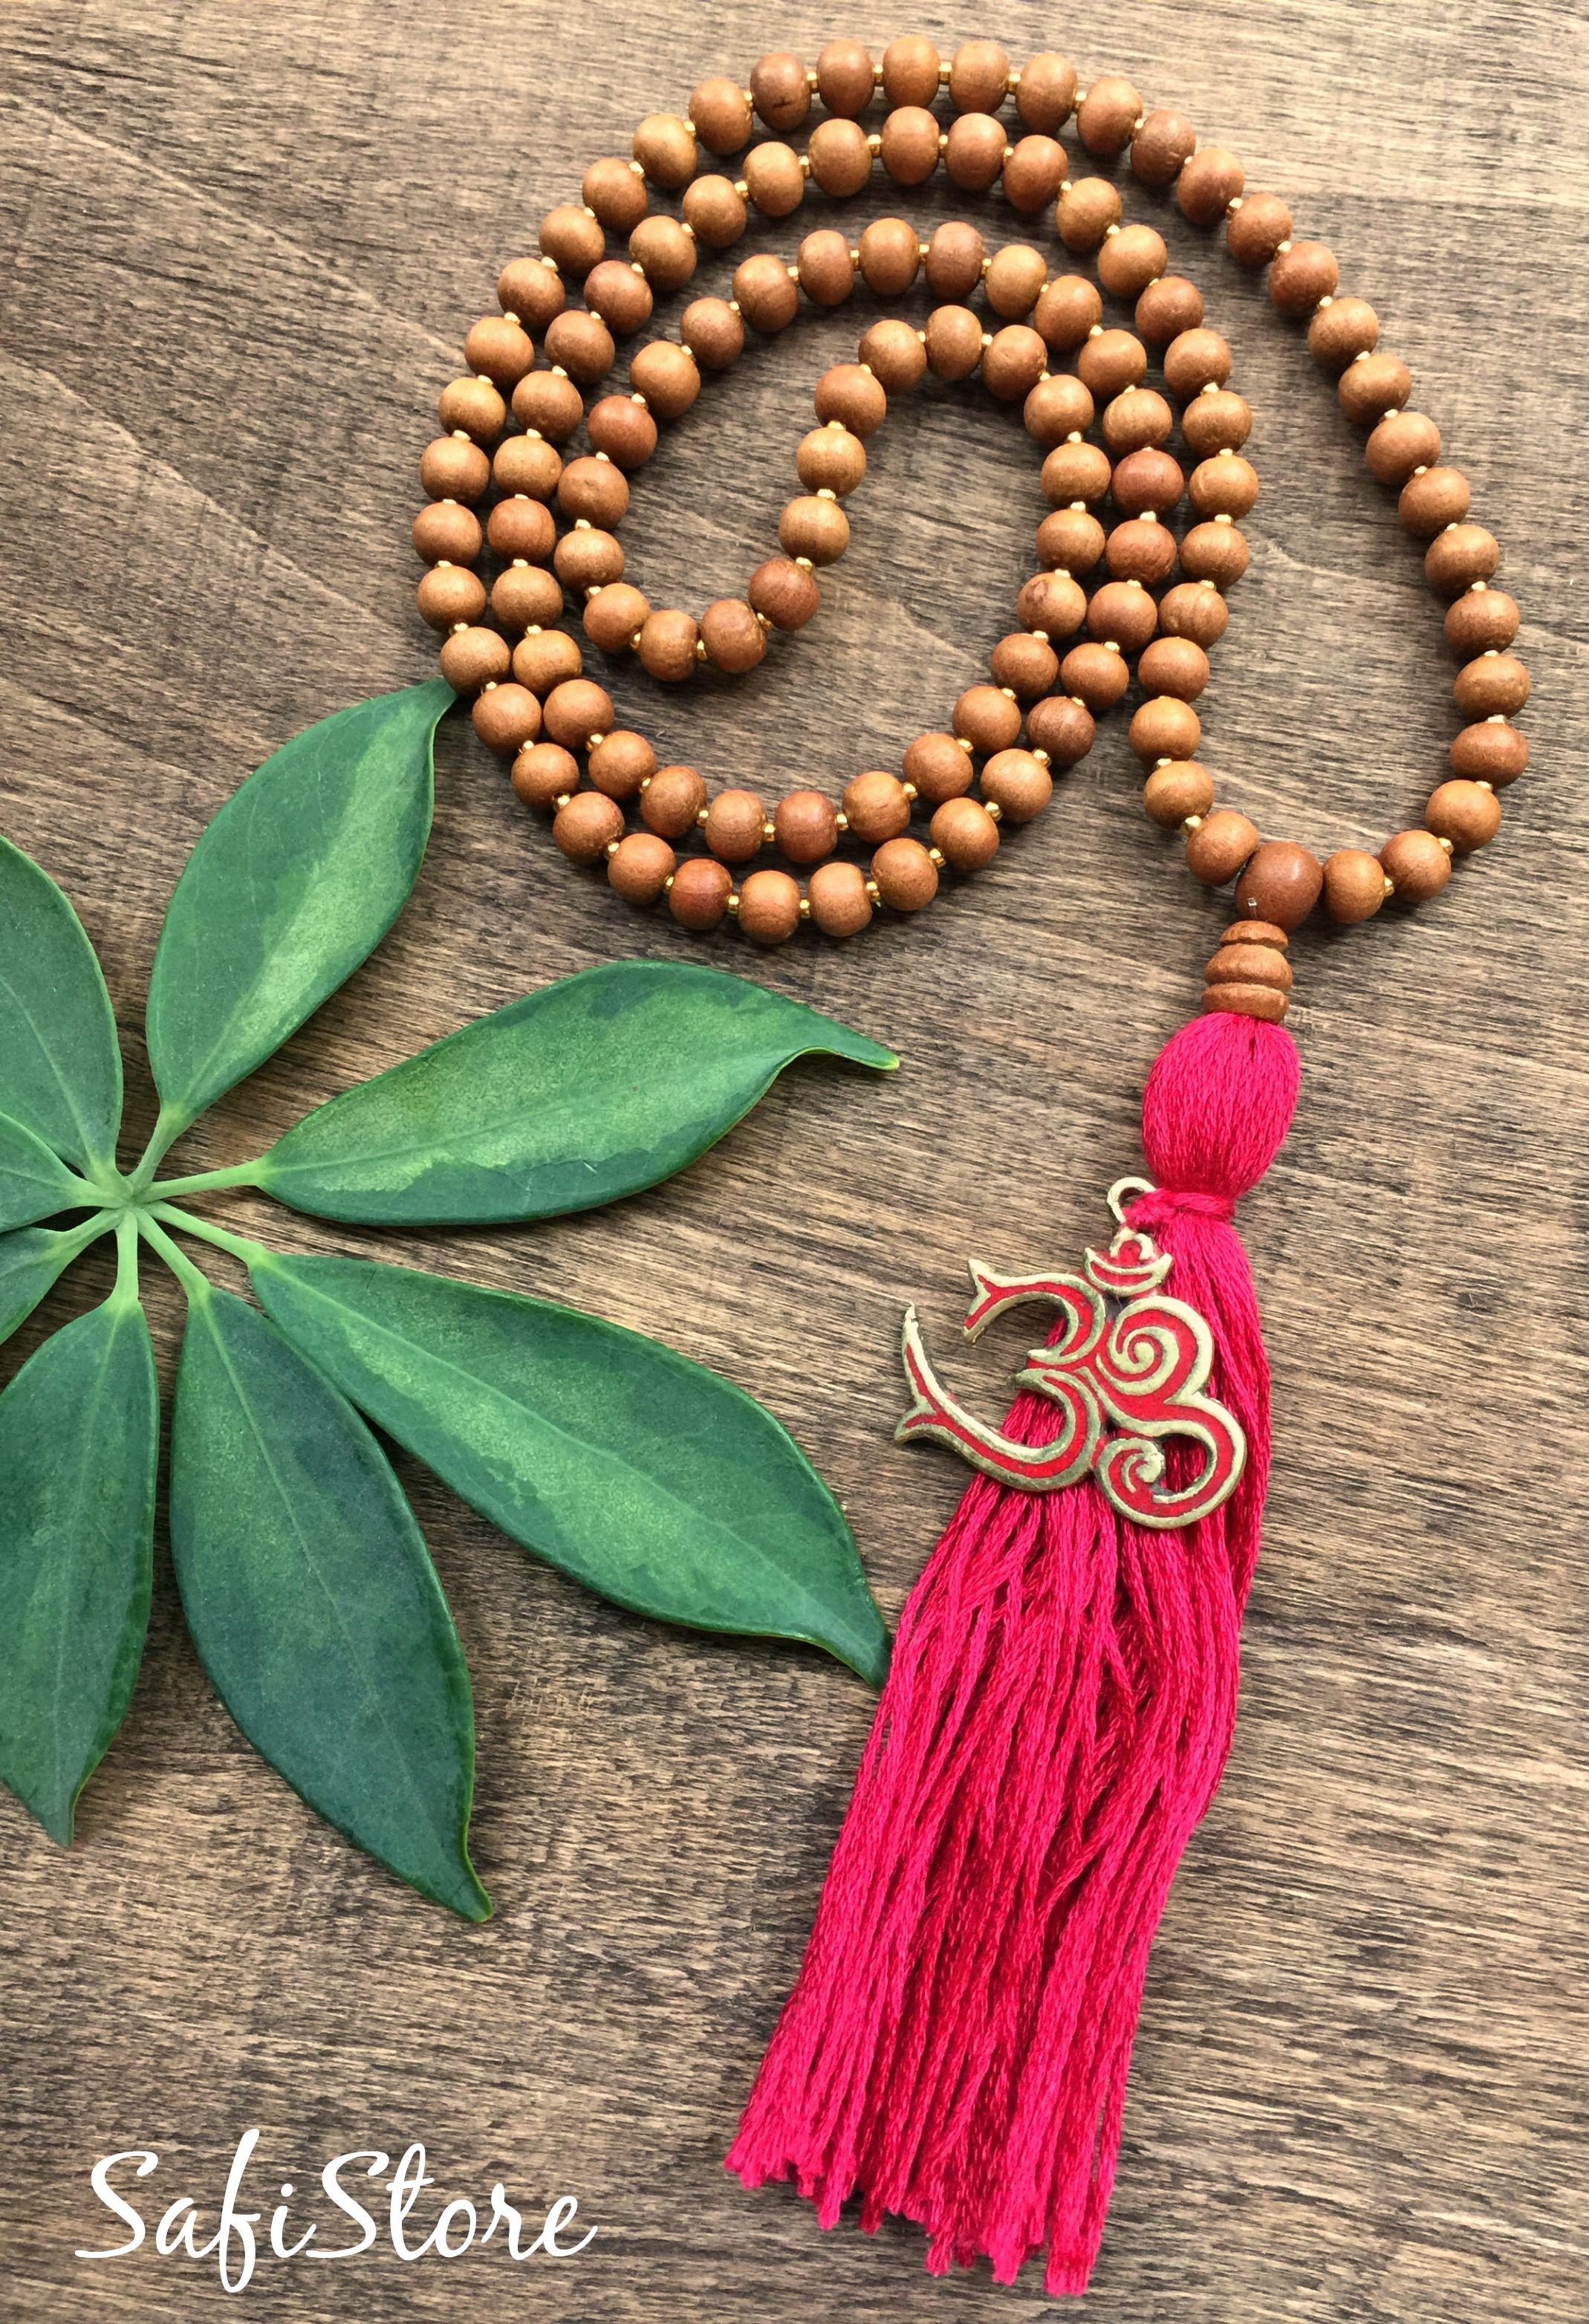 Aromatic Sandalwood 108 Beads Mala Bead Necklace / Reiki, Yoga